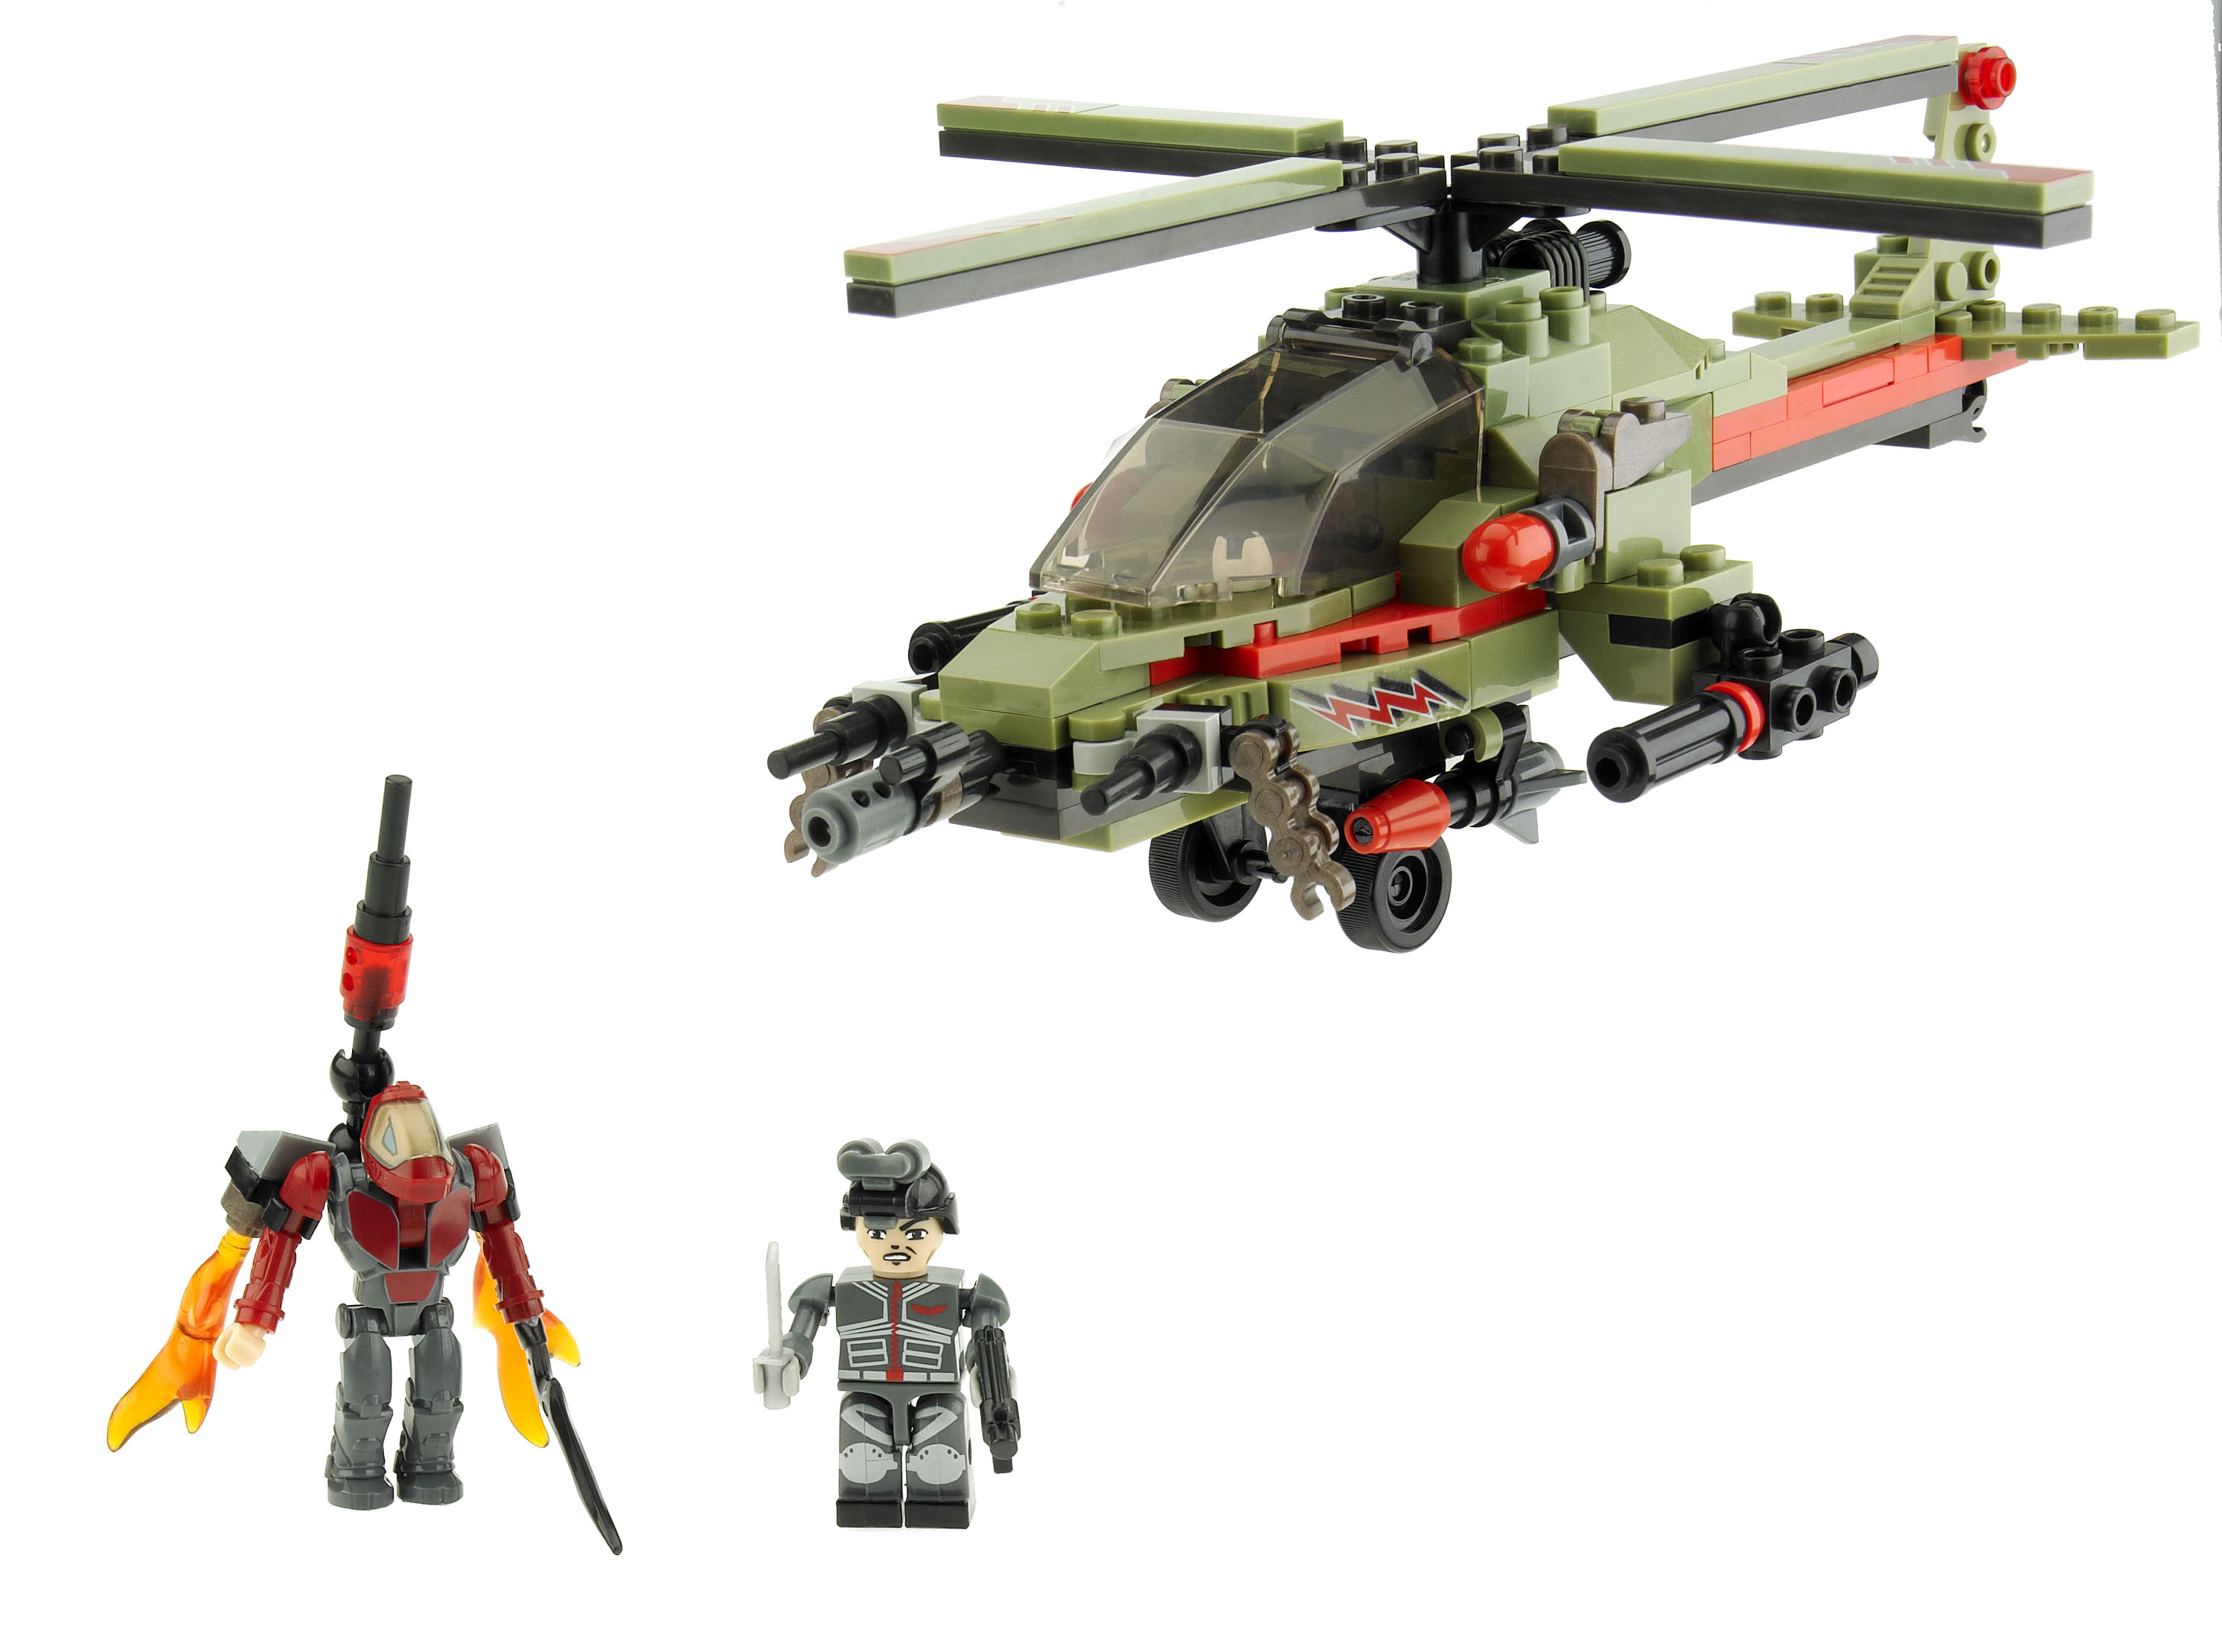 Classic Battleship Movie Edition game & KRE-O Battleship Combat Chopper Set Giveaway